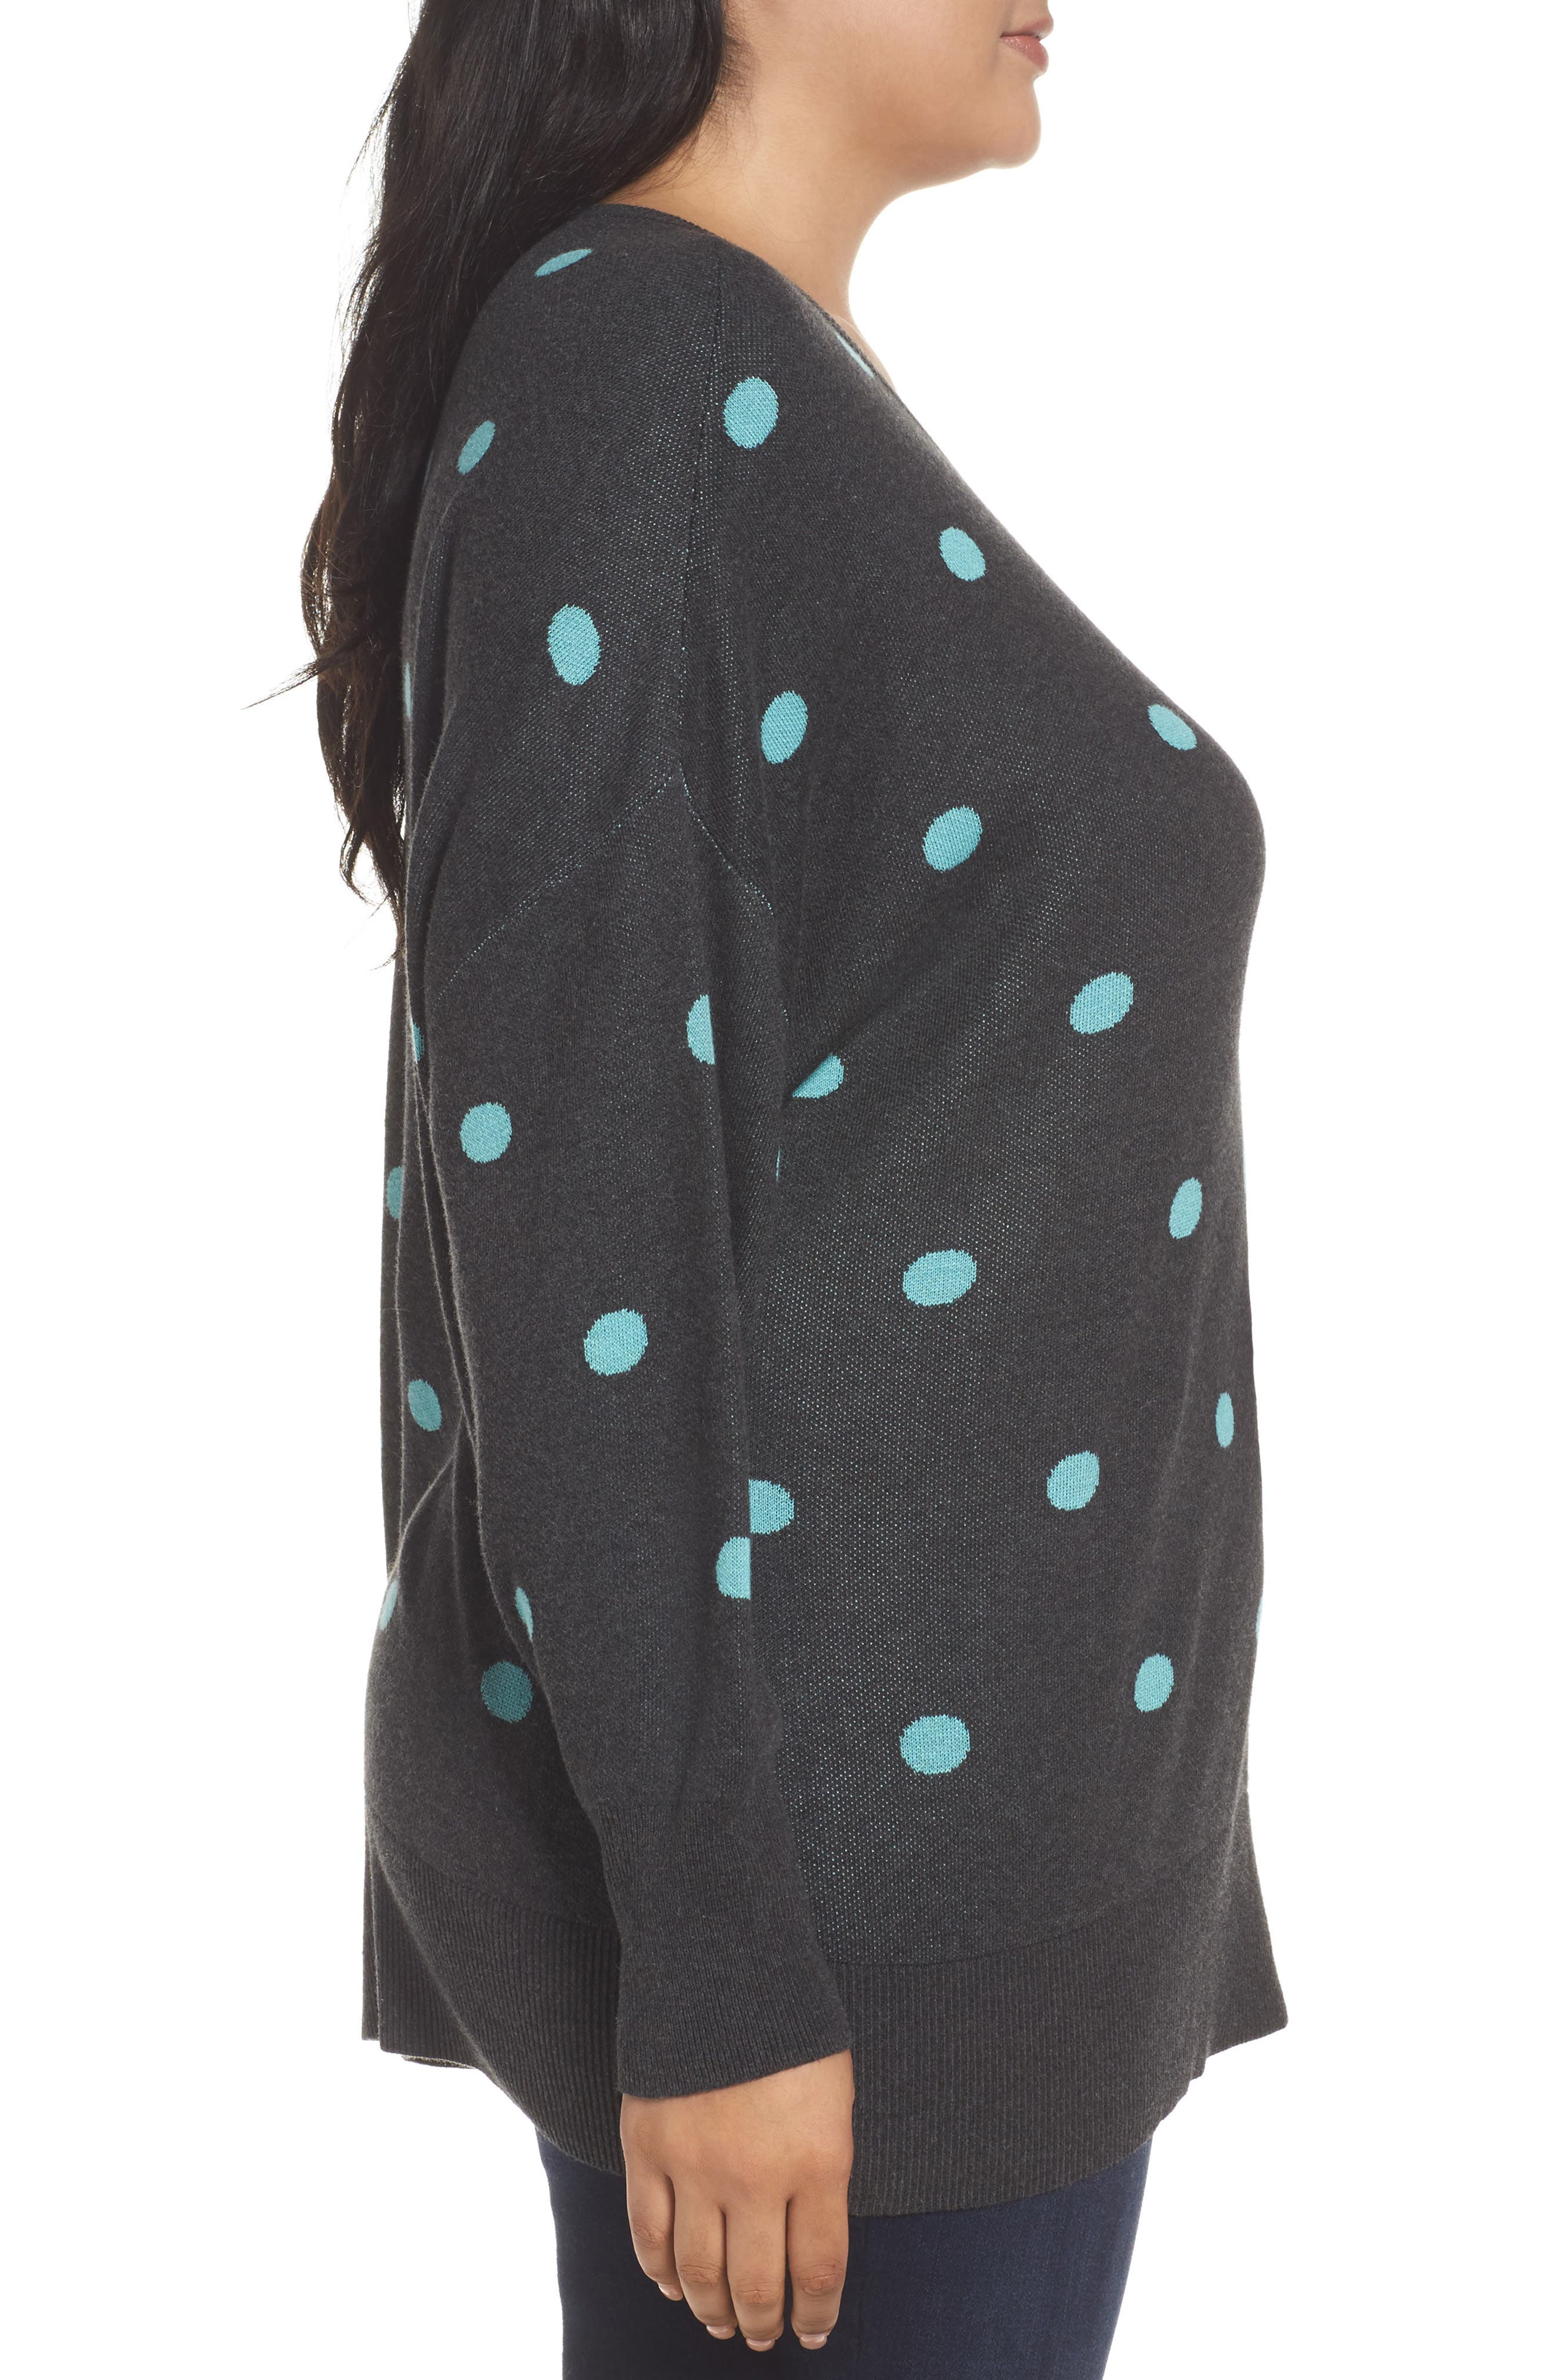 Dolman Sleeve Crewneck Sweater,                             Alternate thumbnail 3, color,                             Grey- Blue Dots Pattern